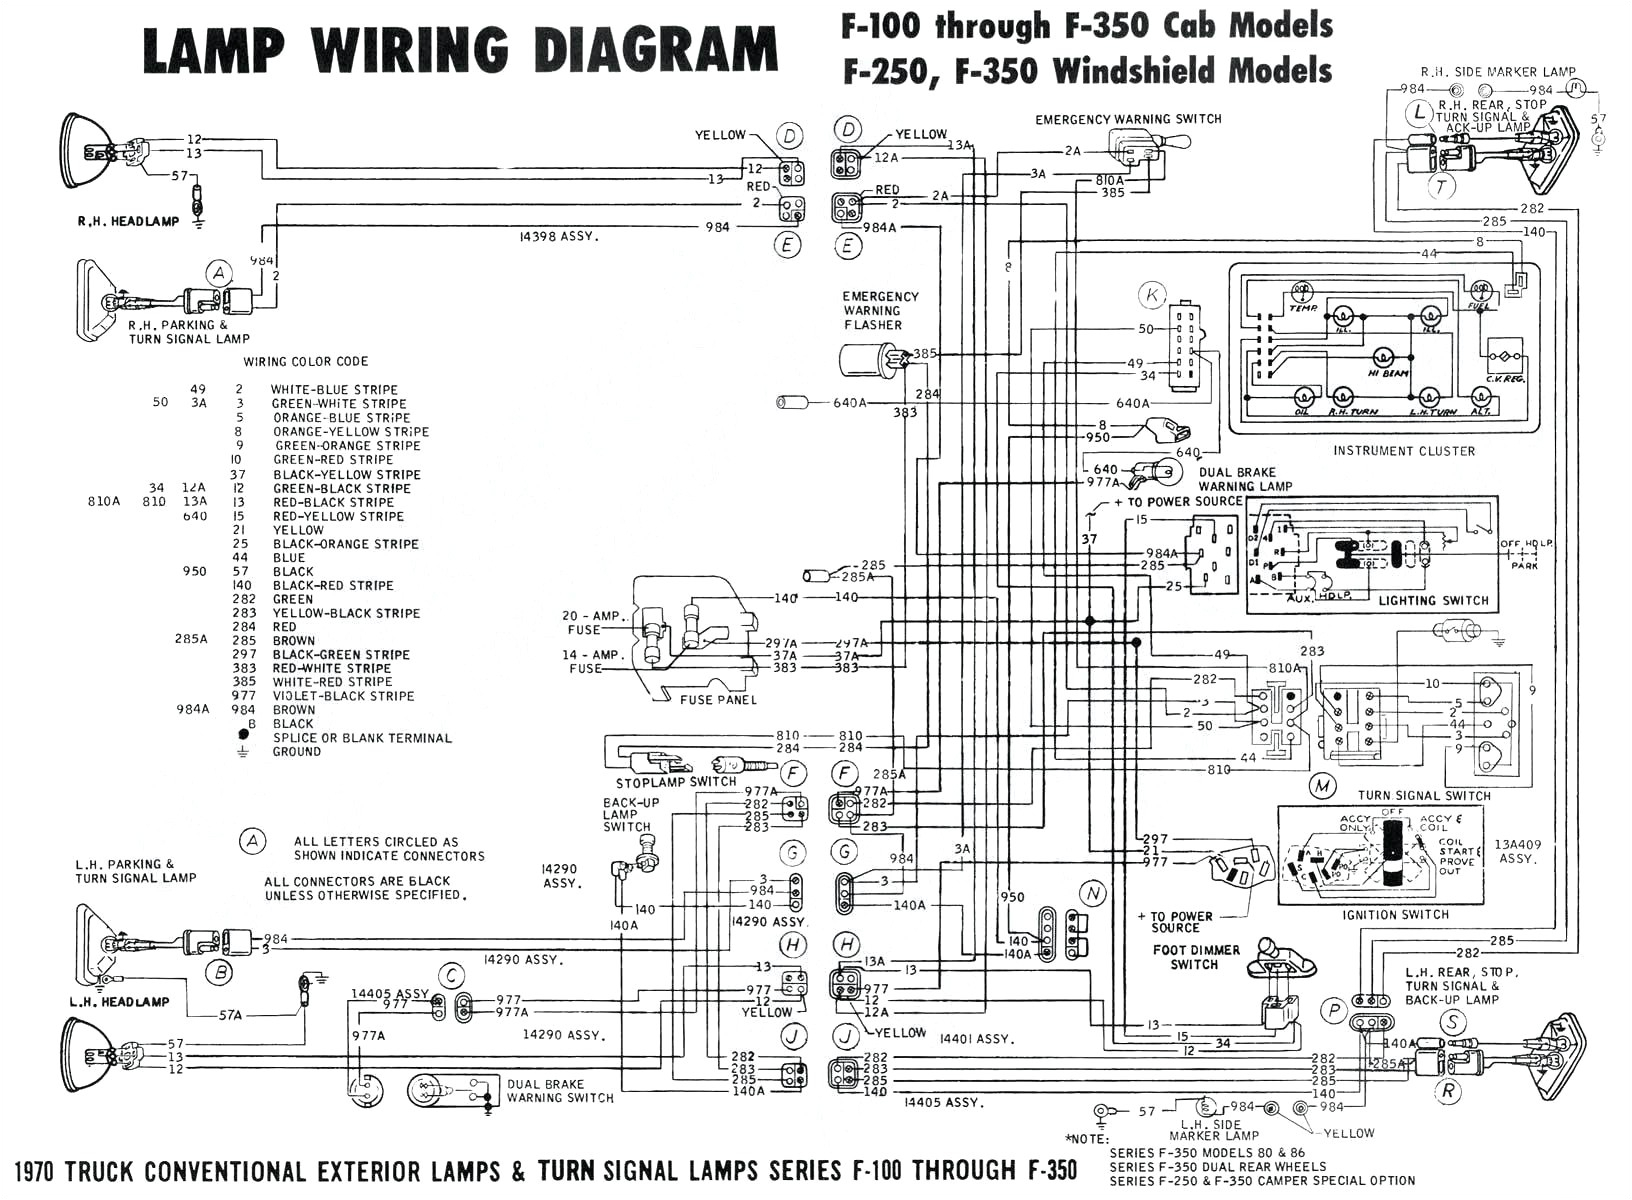 chevy headlight switch wiring diagram chevy dimmer switch wiring diagram refrence brake light wiring diagram chevy manual new tail light wiring 3k jpg